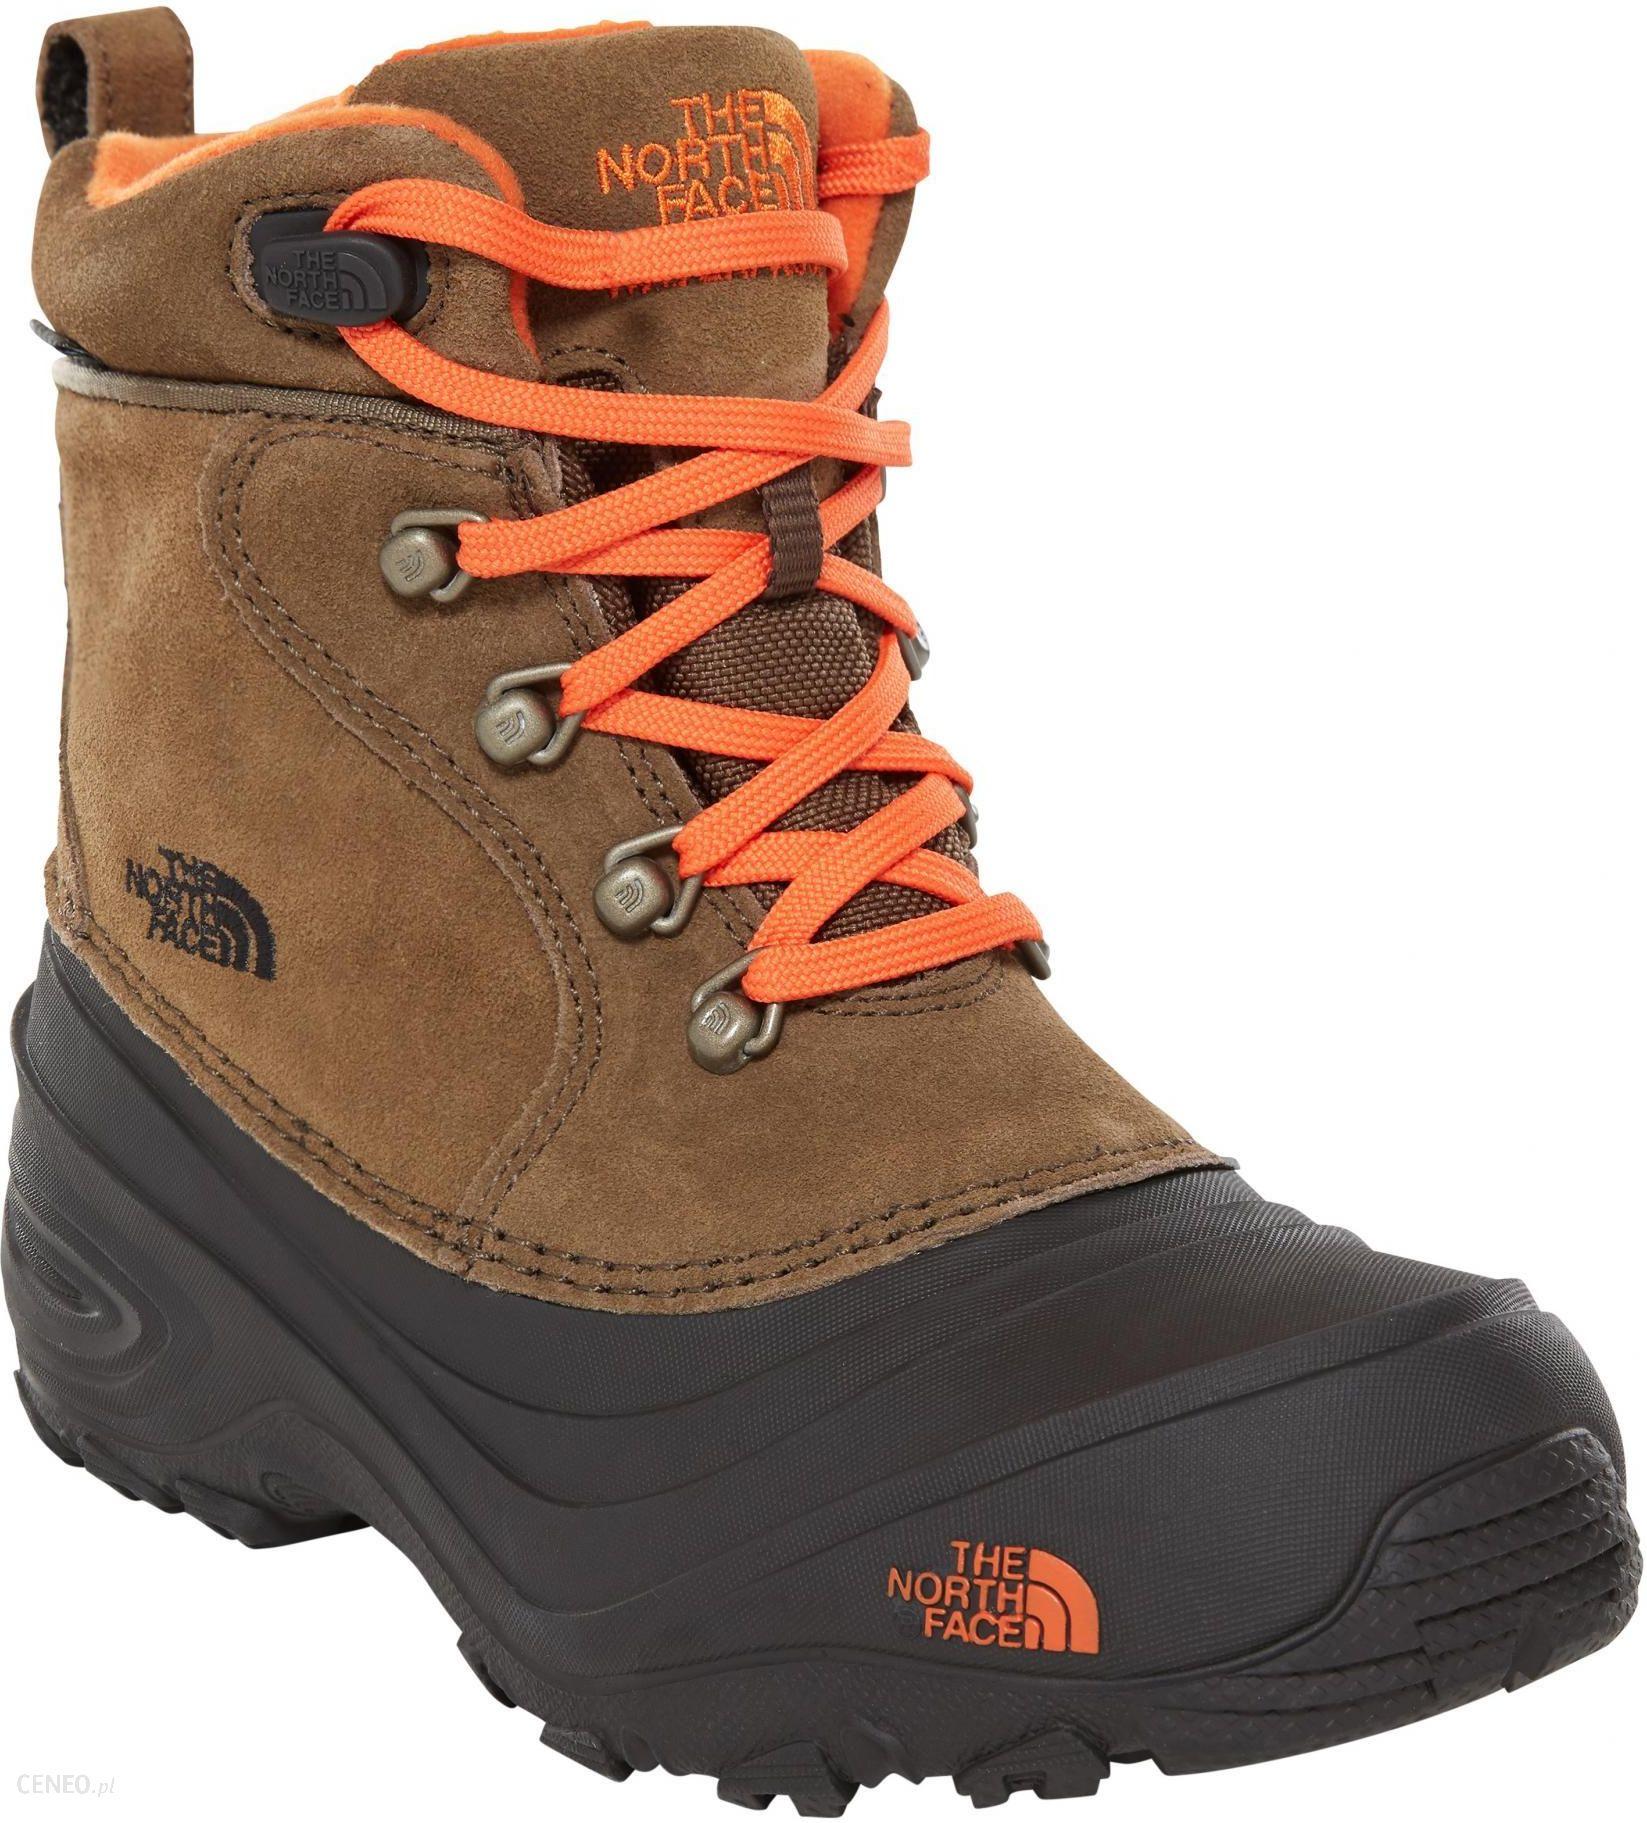 The North Face buty zimowe Y Chilkat Lace II Tyrmac miodowybrązowy 37 Ceny i opinie Ceneo.pl